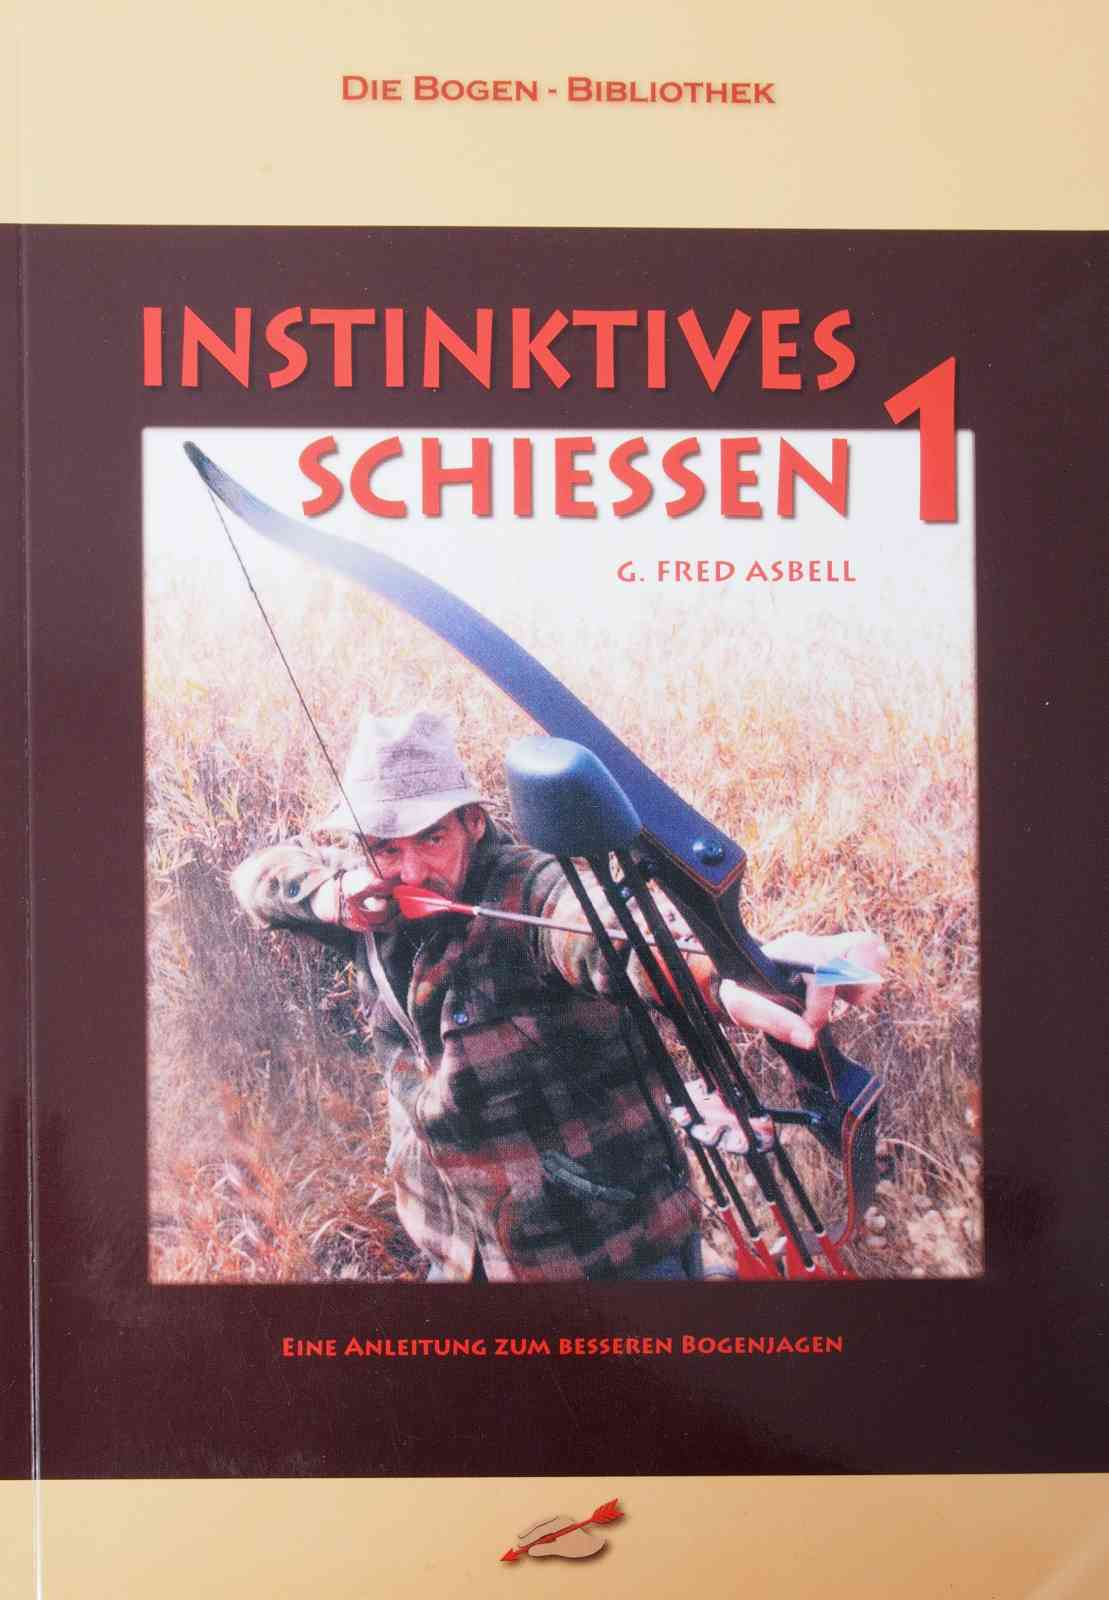 G. Fred Asbell - Instinktives Schiessen 1